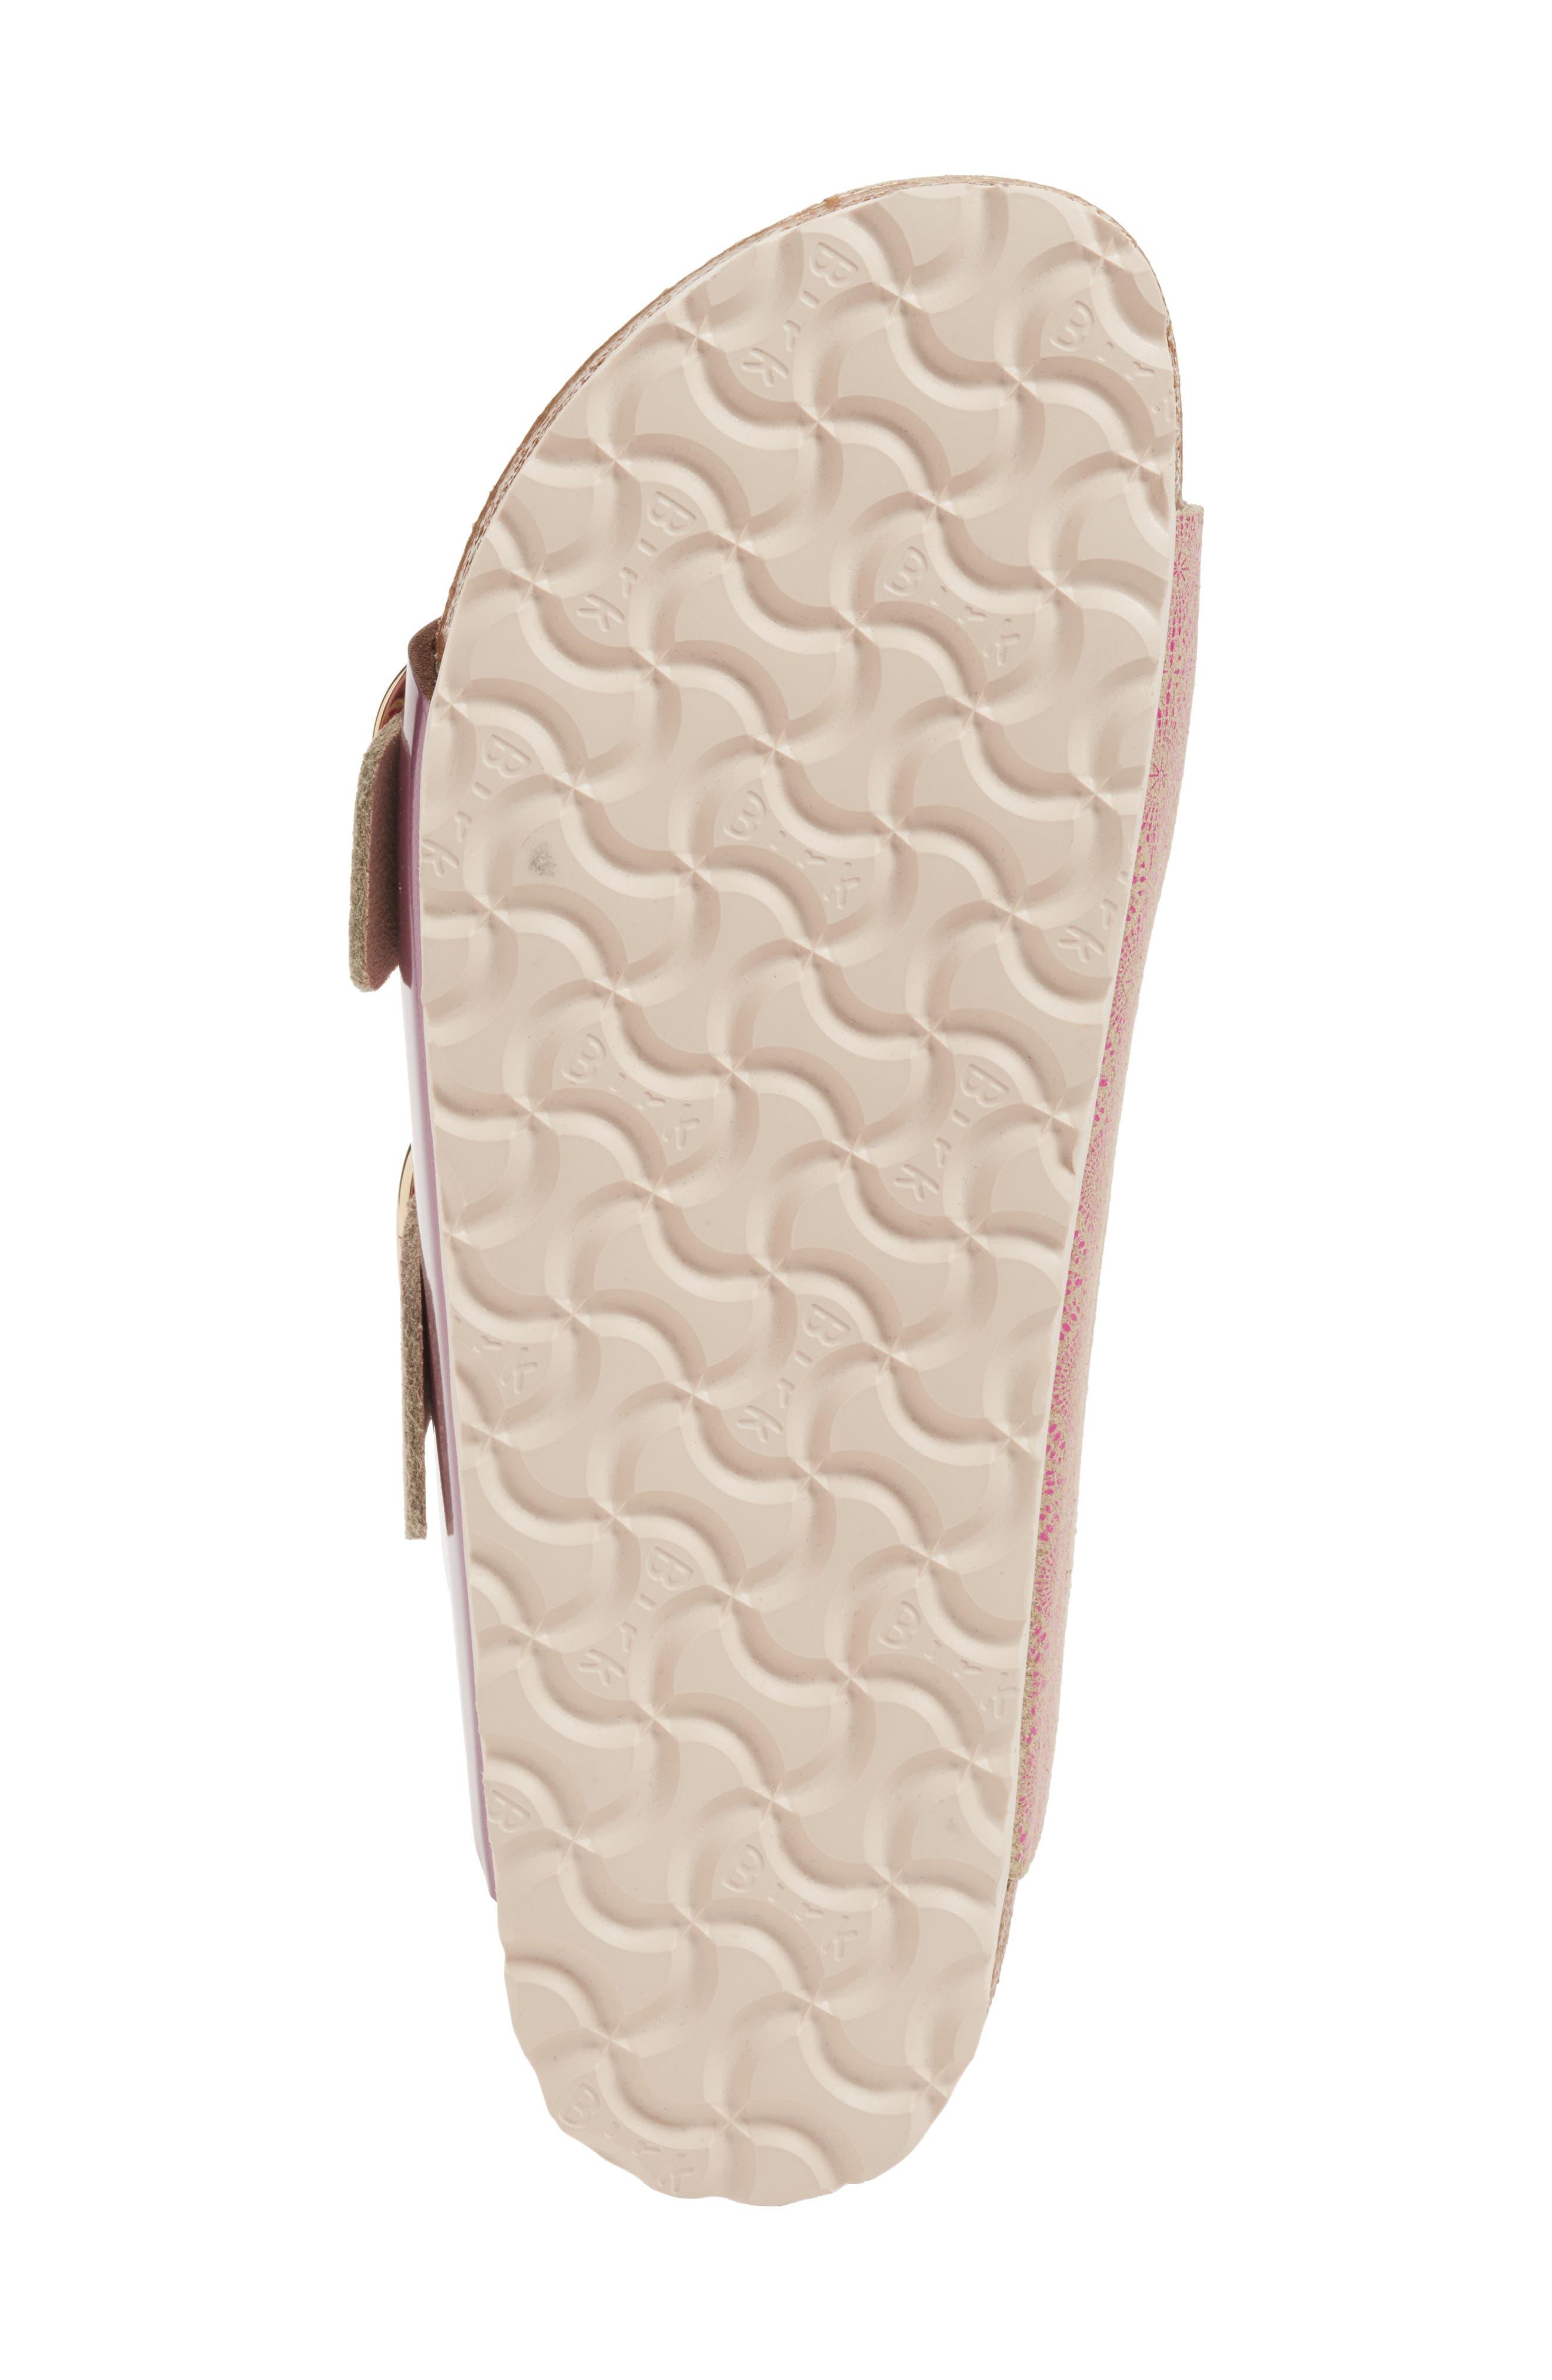 Arizona Big Buckle Slide Sandal,                             Alternate thumbnail 6, color,                             Ceramic Rose Leather